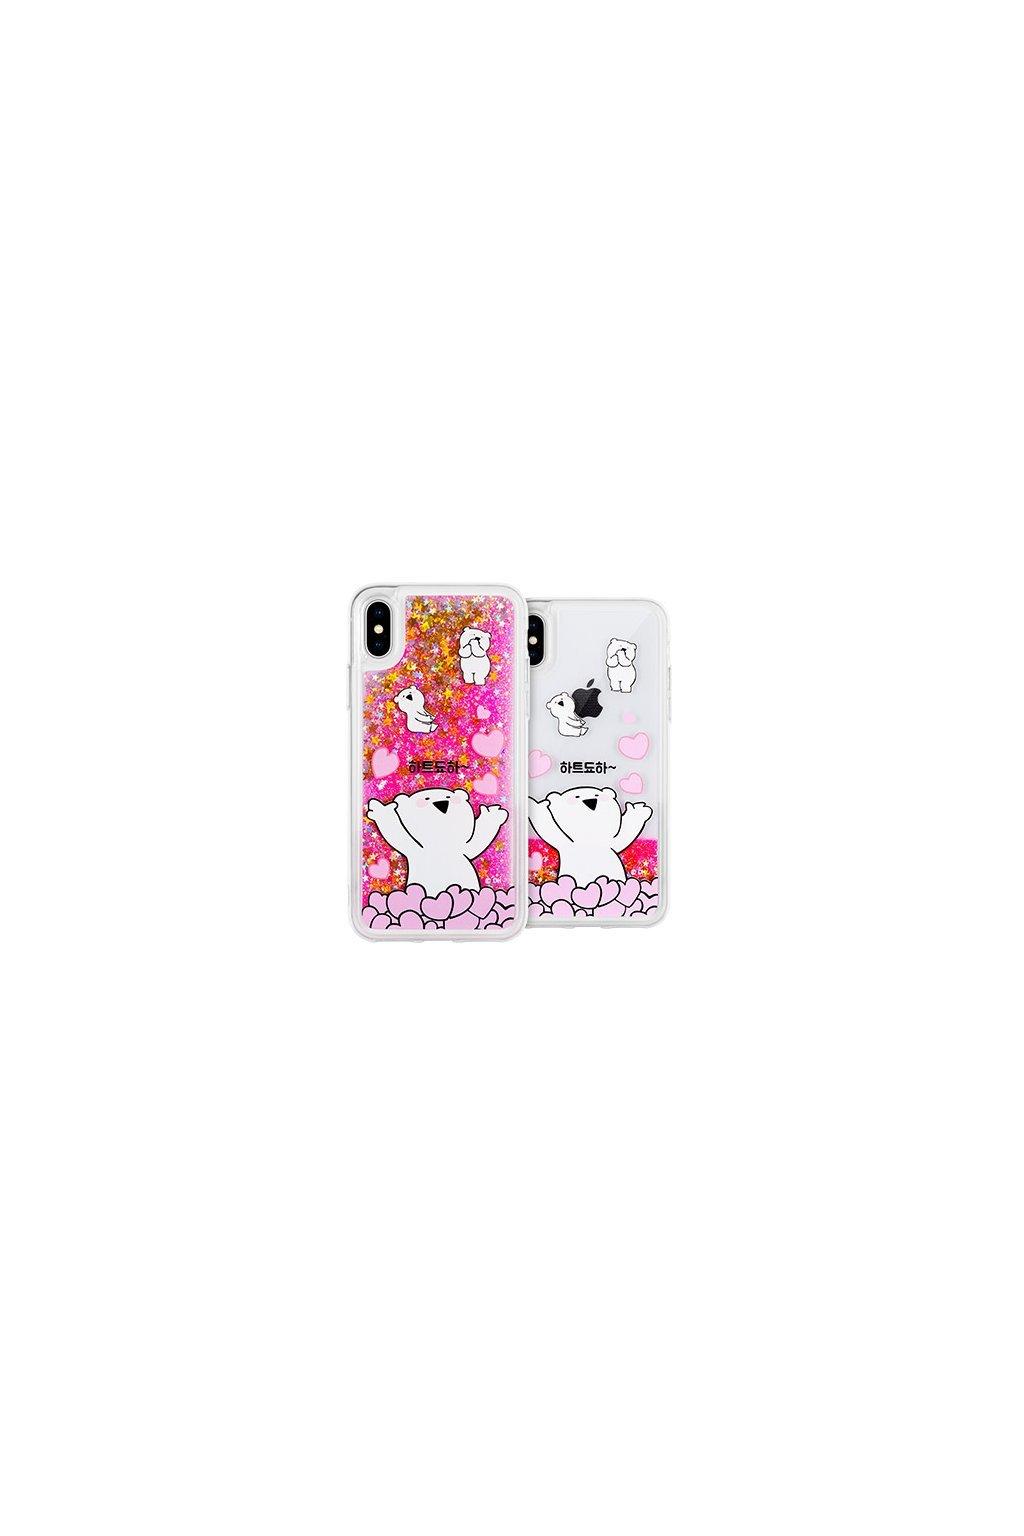 17189 ochranny kryt pro iphone 7 plus 8 plus mercury rabbit glitter heart